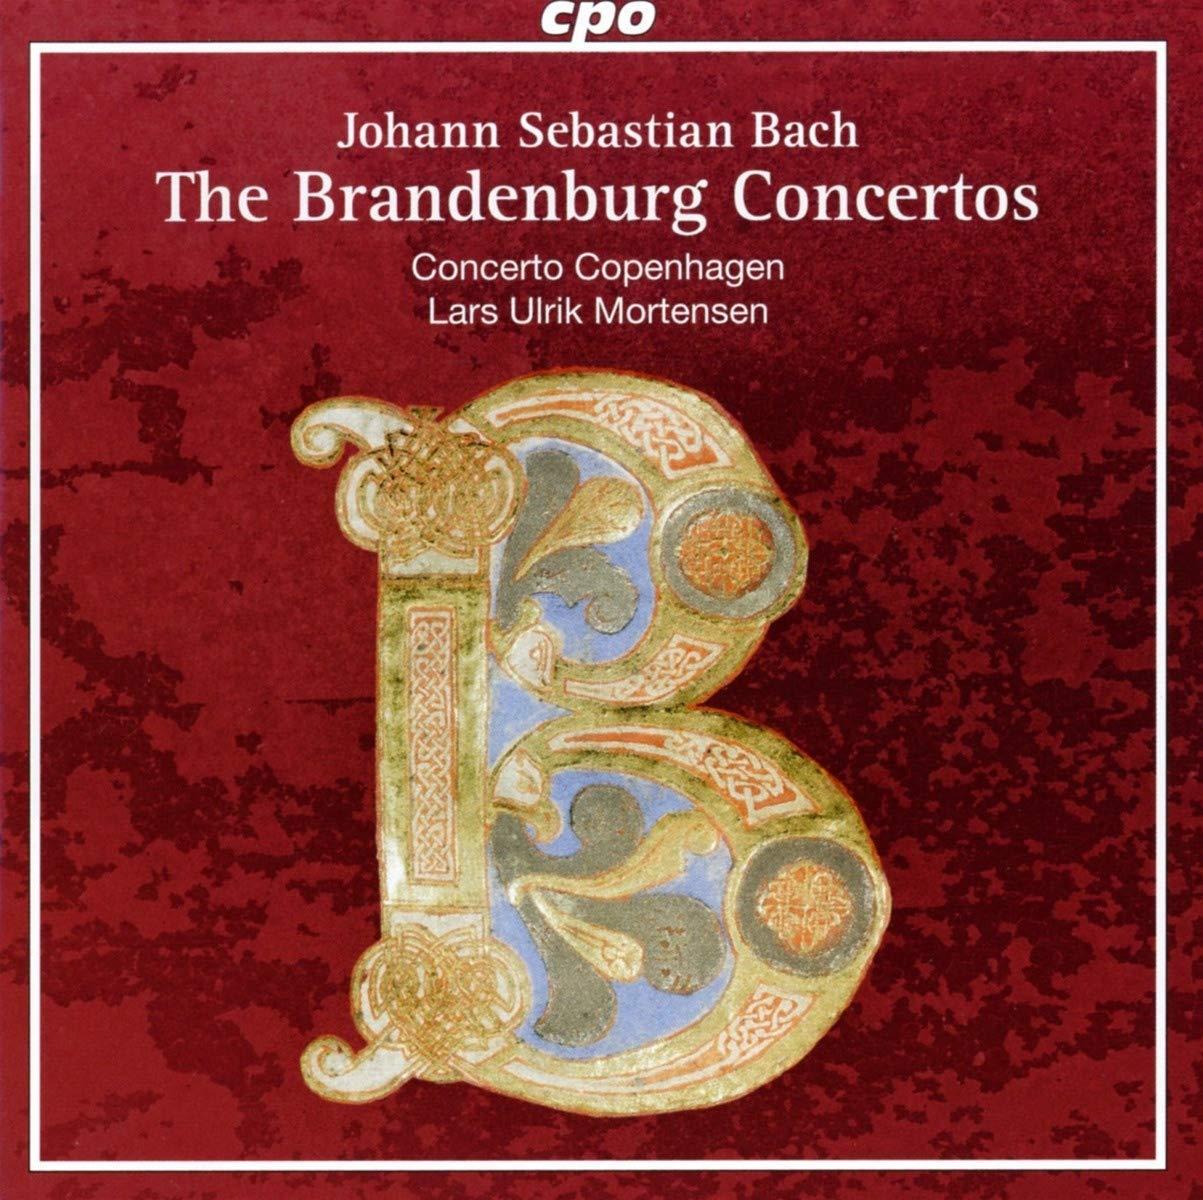 SACD : CONCERTO COPENHAGEN - Brandenburg Concertos (Hybrid SACD, 2 Pack)